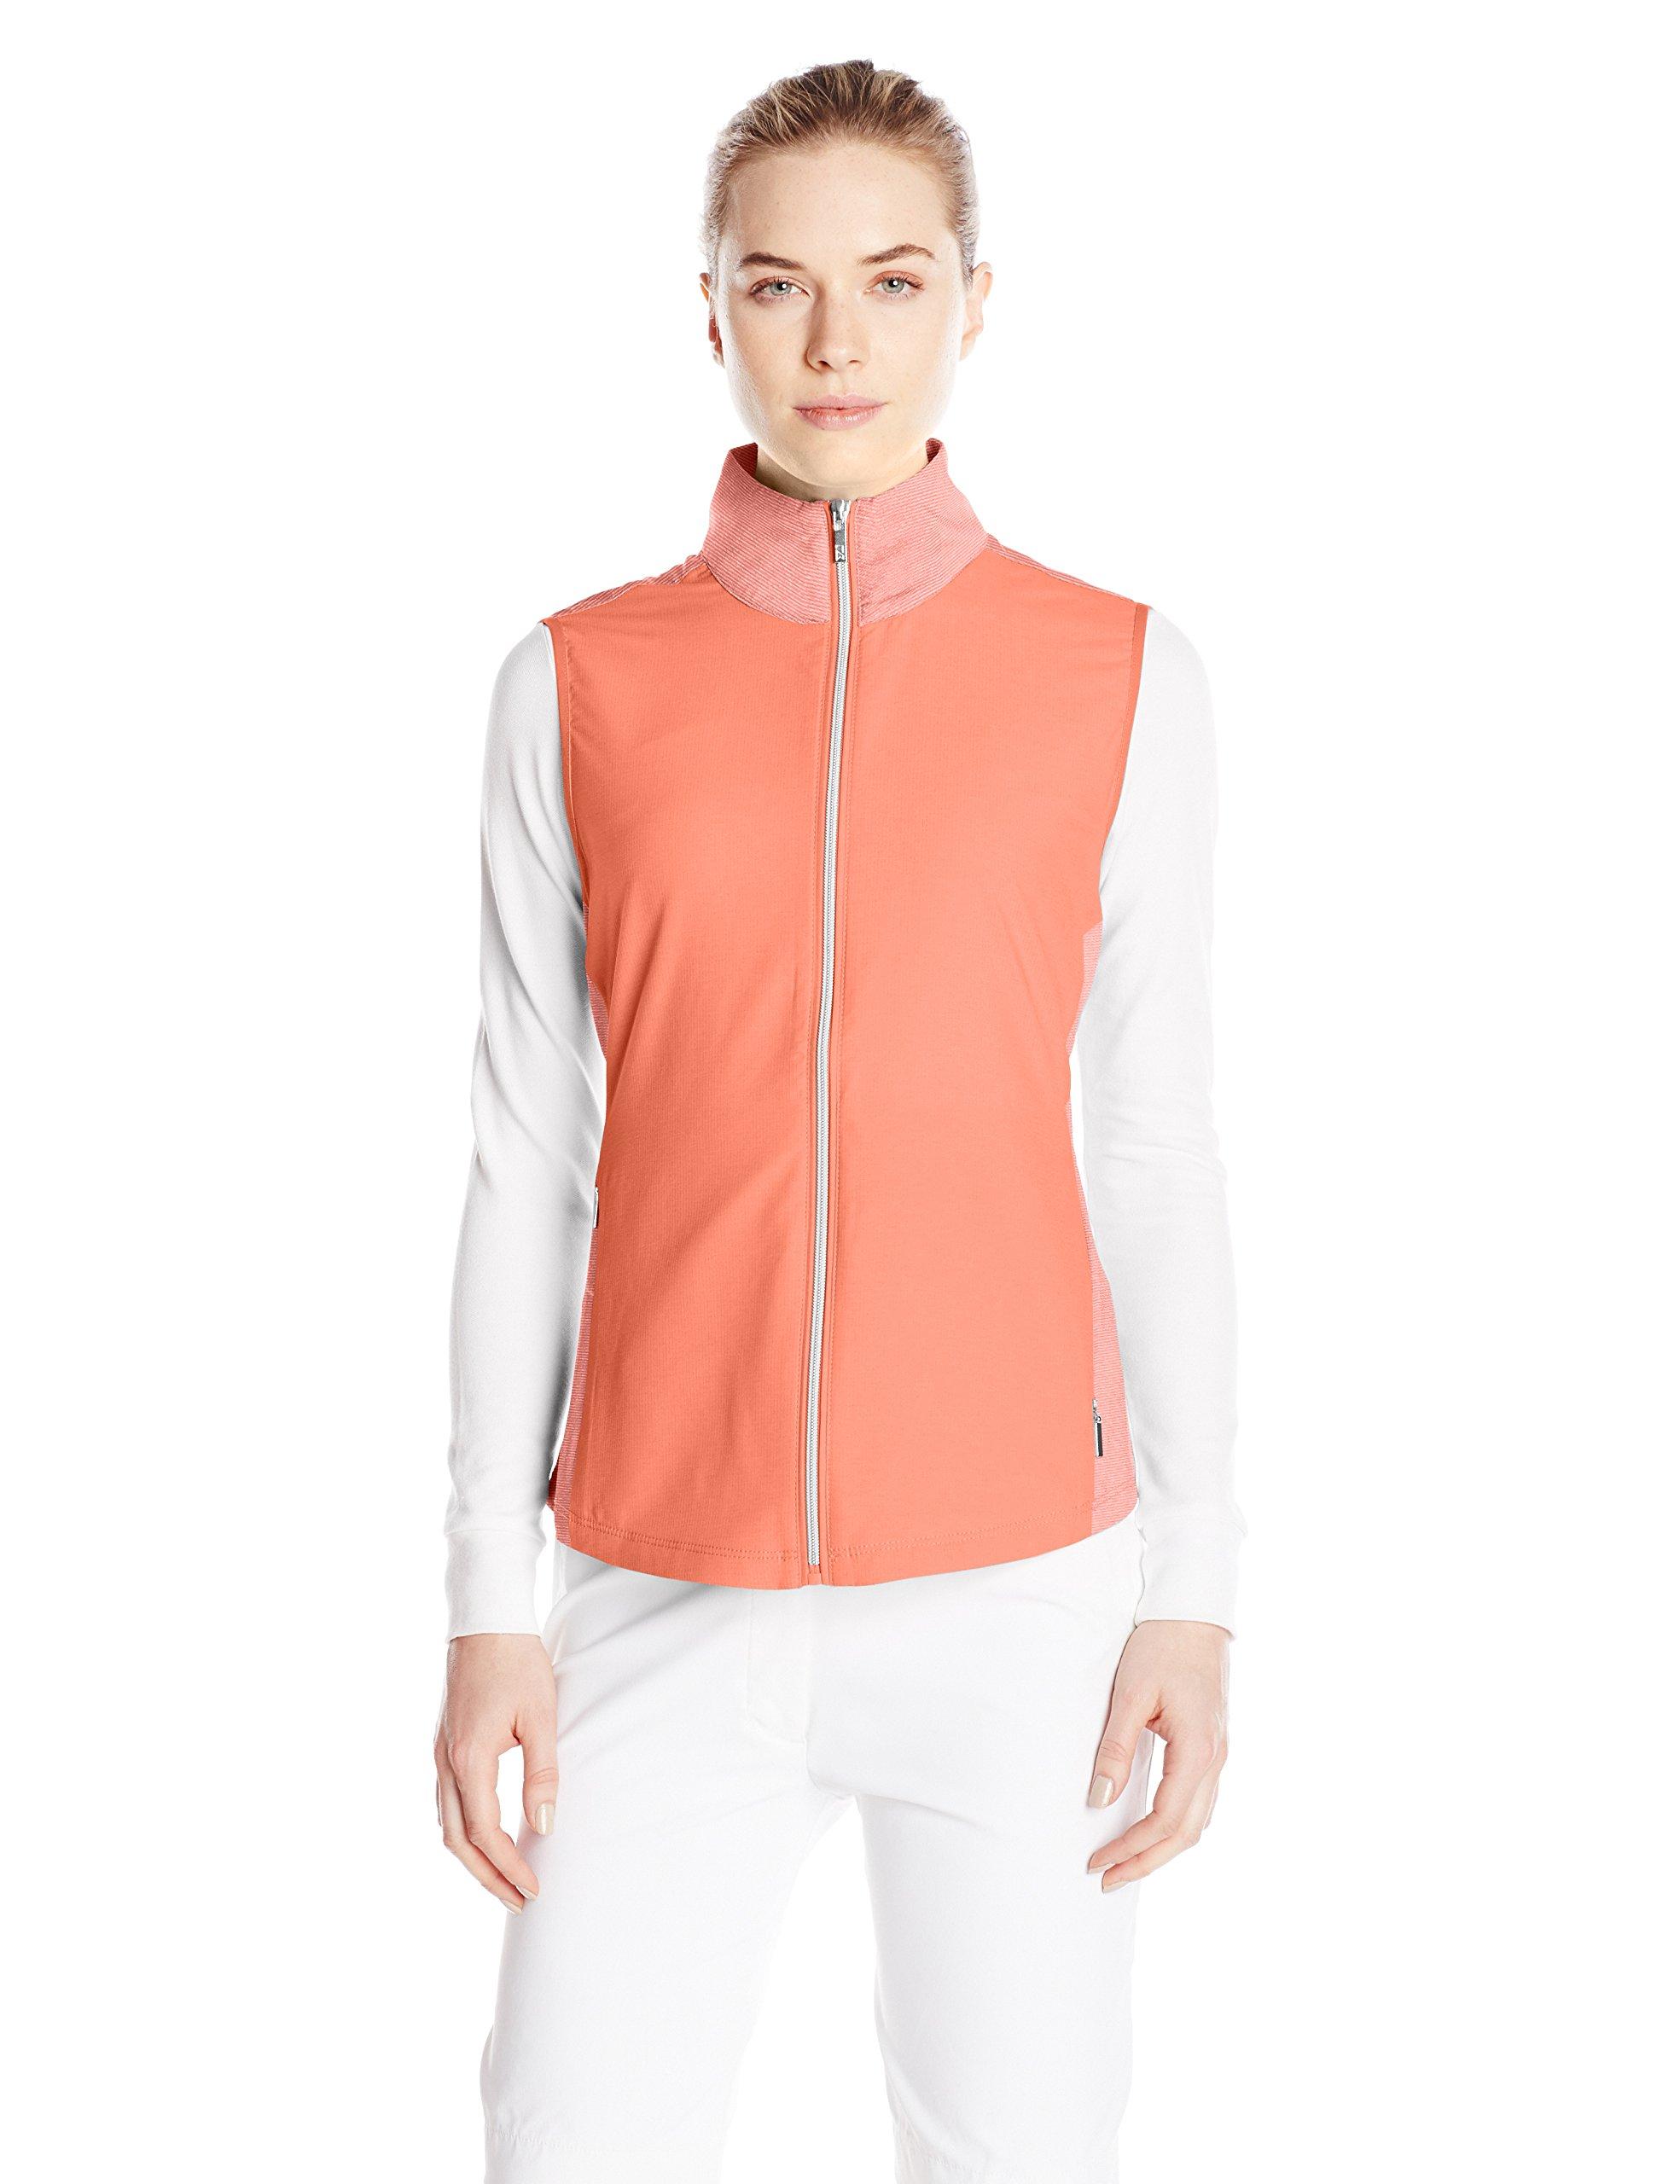 Cutter & Buck Women's CB Weathertec Laura Hybrid Vest, Spark, Small by Cutter